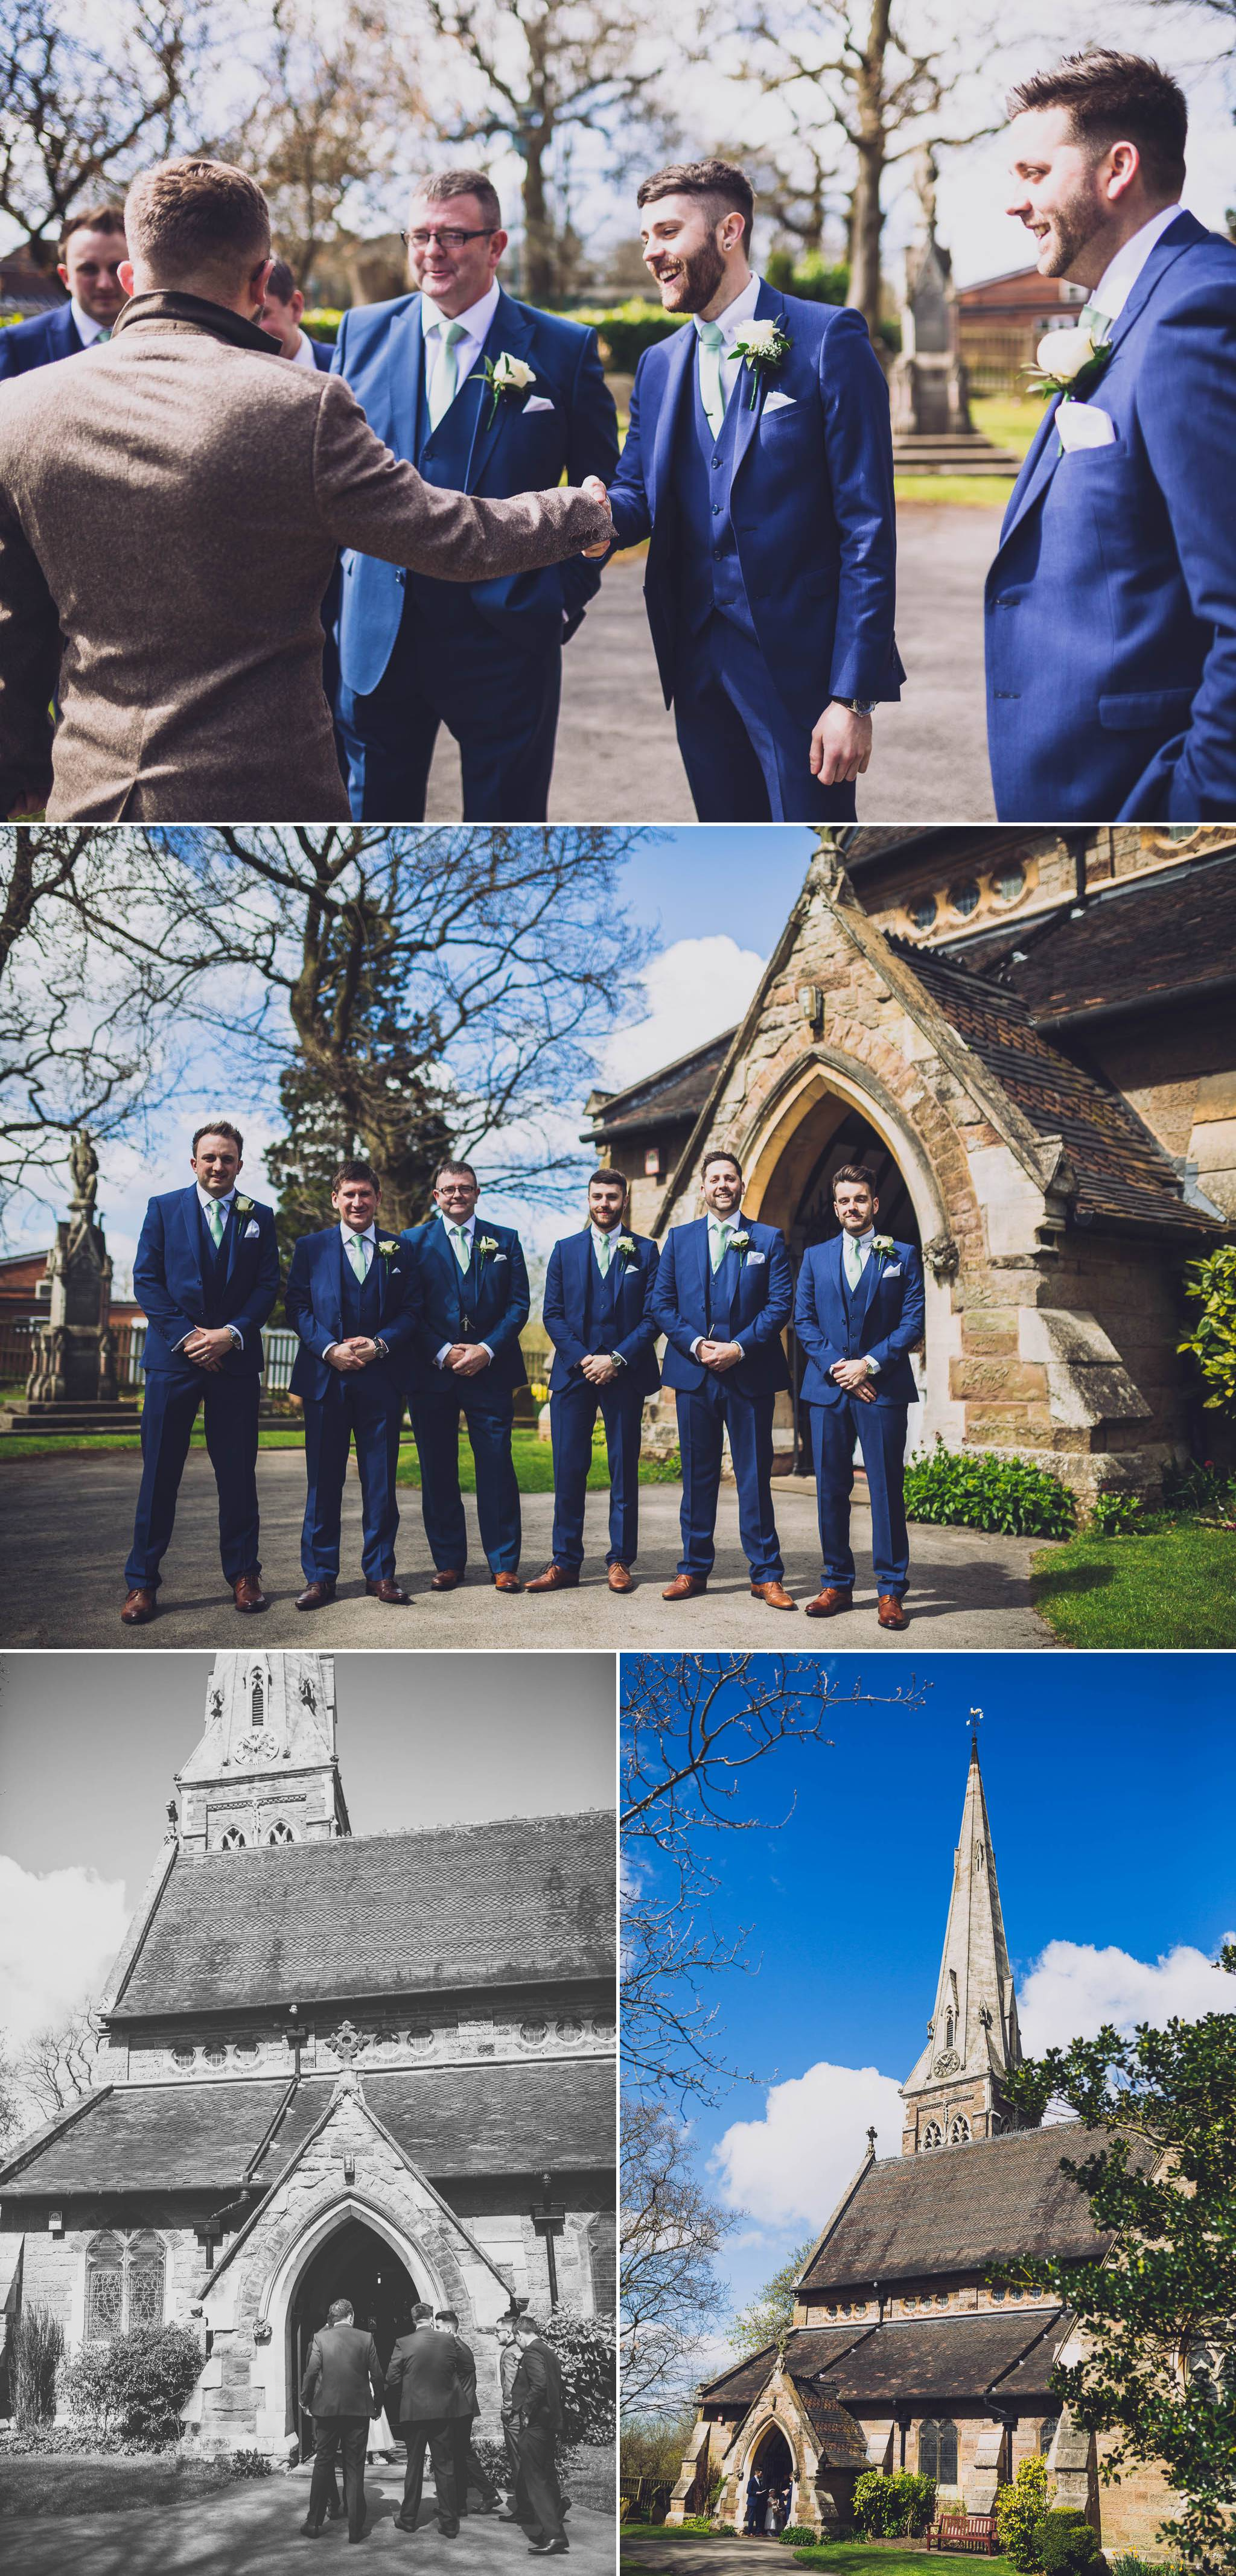 warwickshire-wedding-photographer 5.jpg